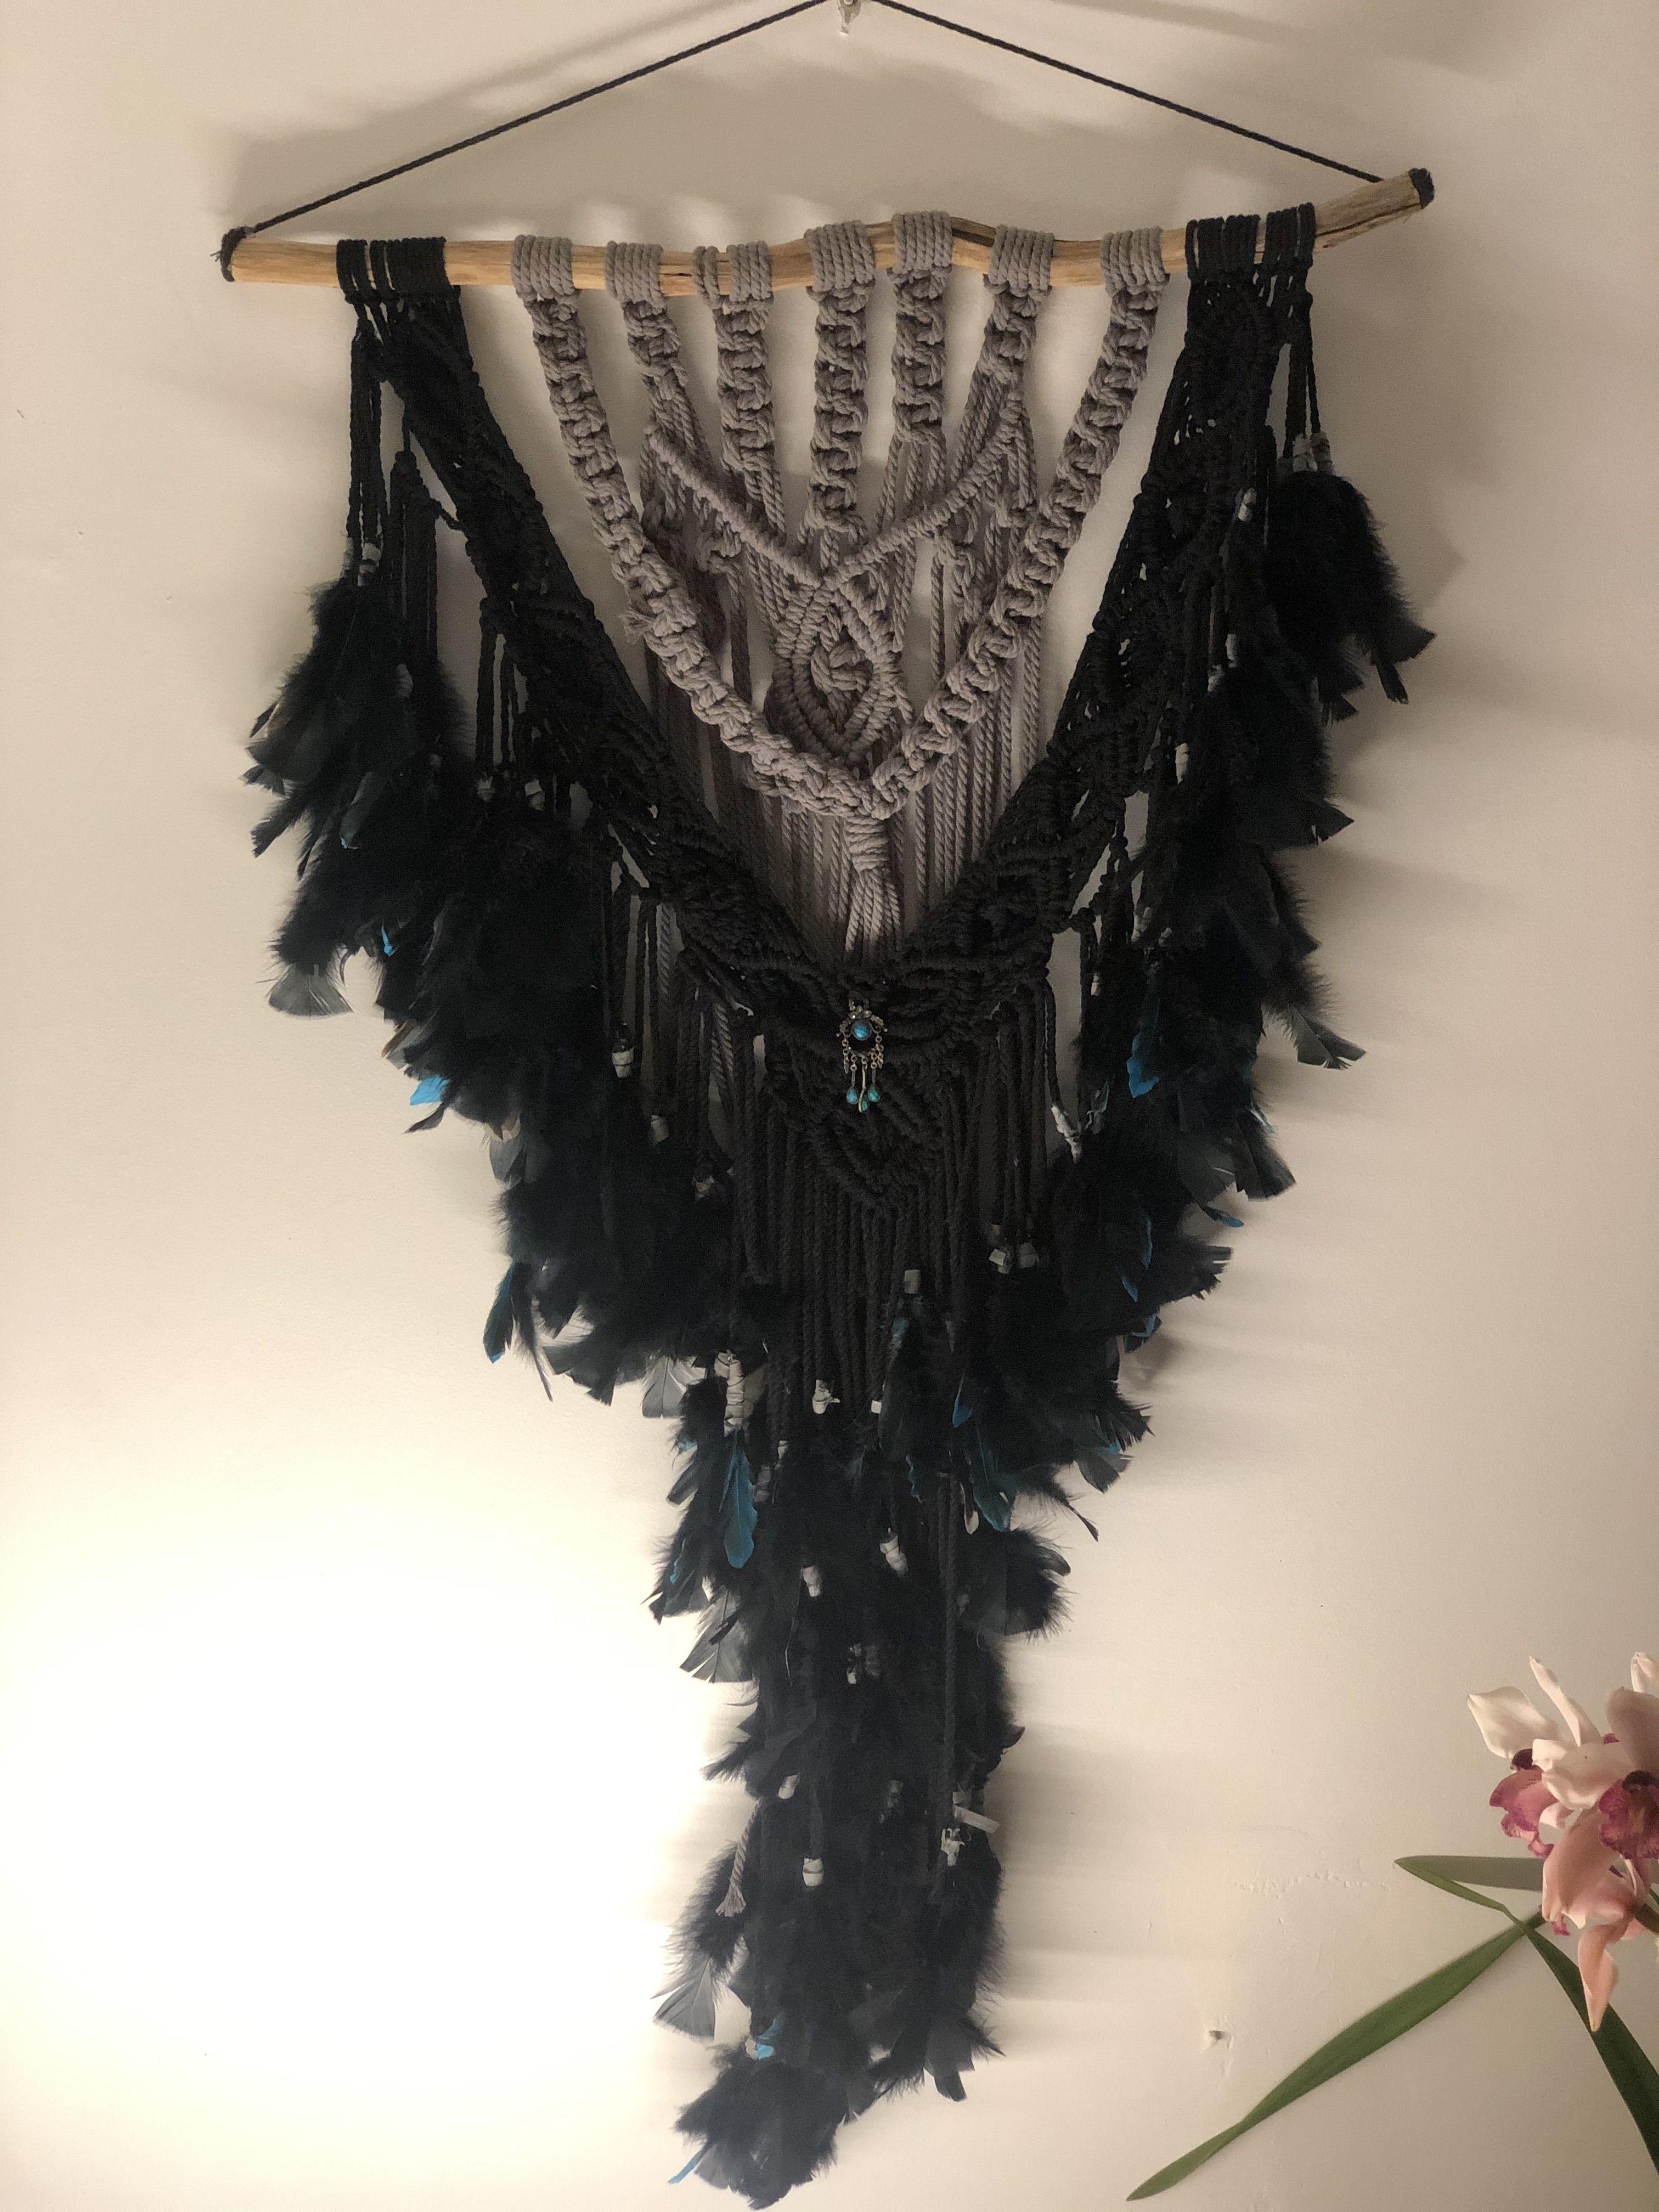 Stunning Macrame Wall Hanging Hand Crafted Gifts Kawaii Wallpaper Arts And Crafts